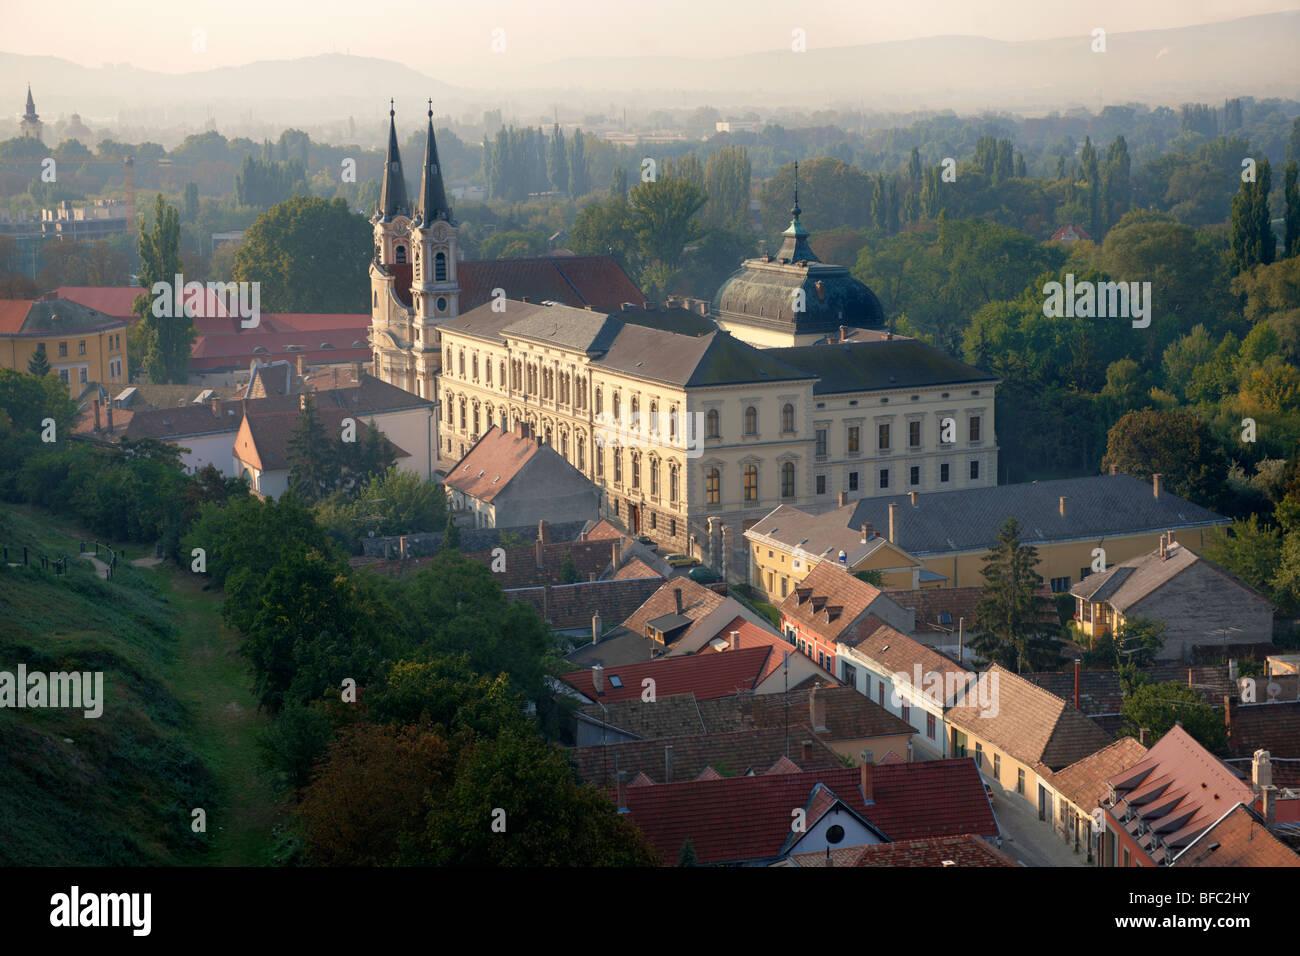 The Baroque Jesuit church and museum, Esztergom, Hungary - Stock Image